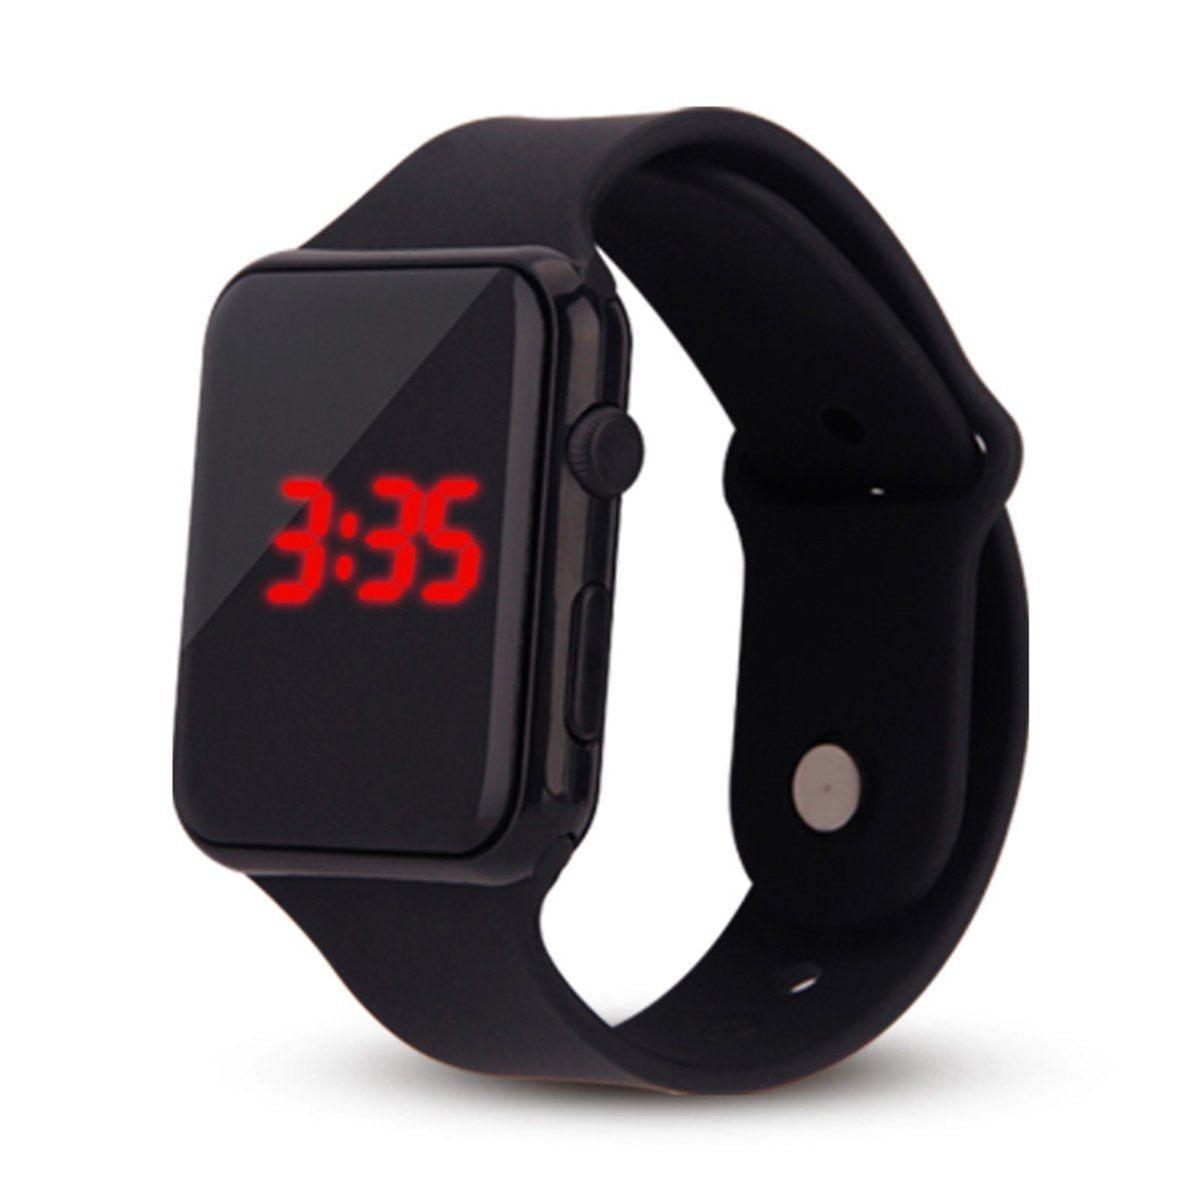 Digitale Uhren Realistisch 8 Farben Mode Led Sport Lauf Uhr Datum Silikon Armband Digitale Armbanduhr Sport Uhr Damen Herren Fitness Uhr Saat Kaufe Jetzt